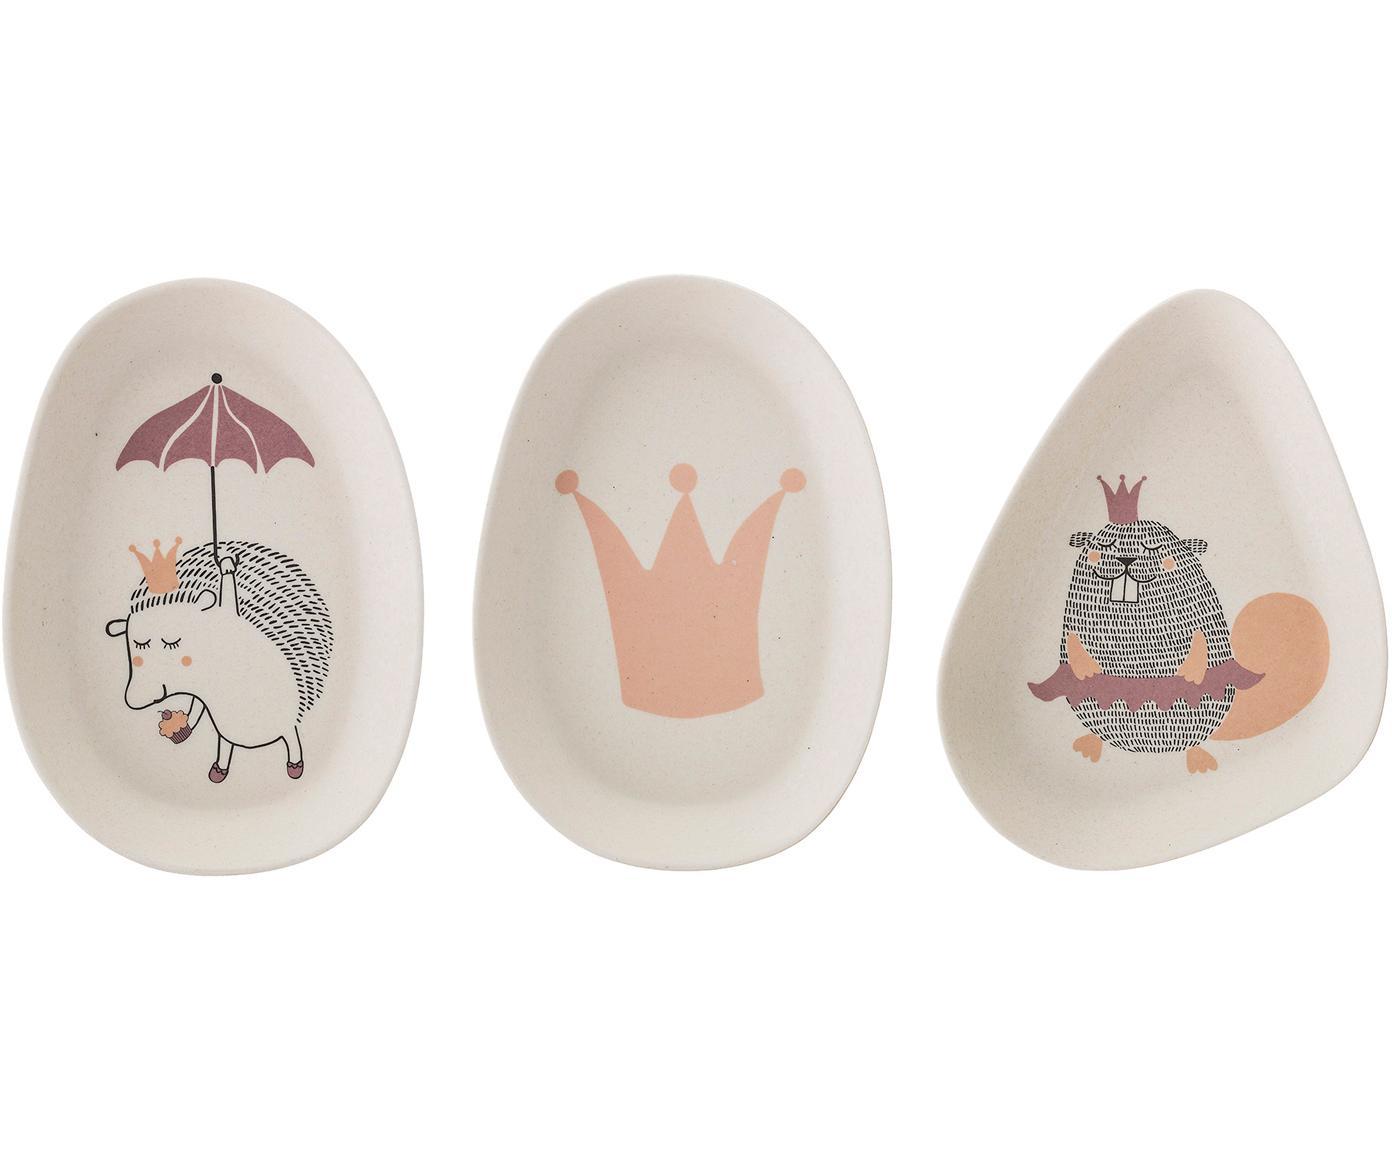 Platos infantiles Princess, Bambú, melamina, Blanco, Tamaños diferentes